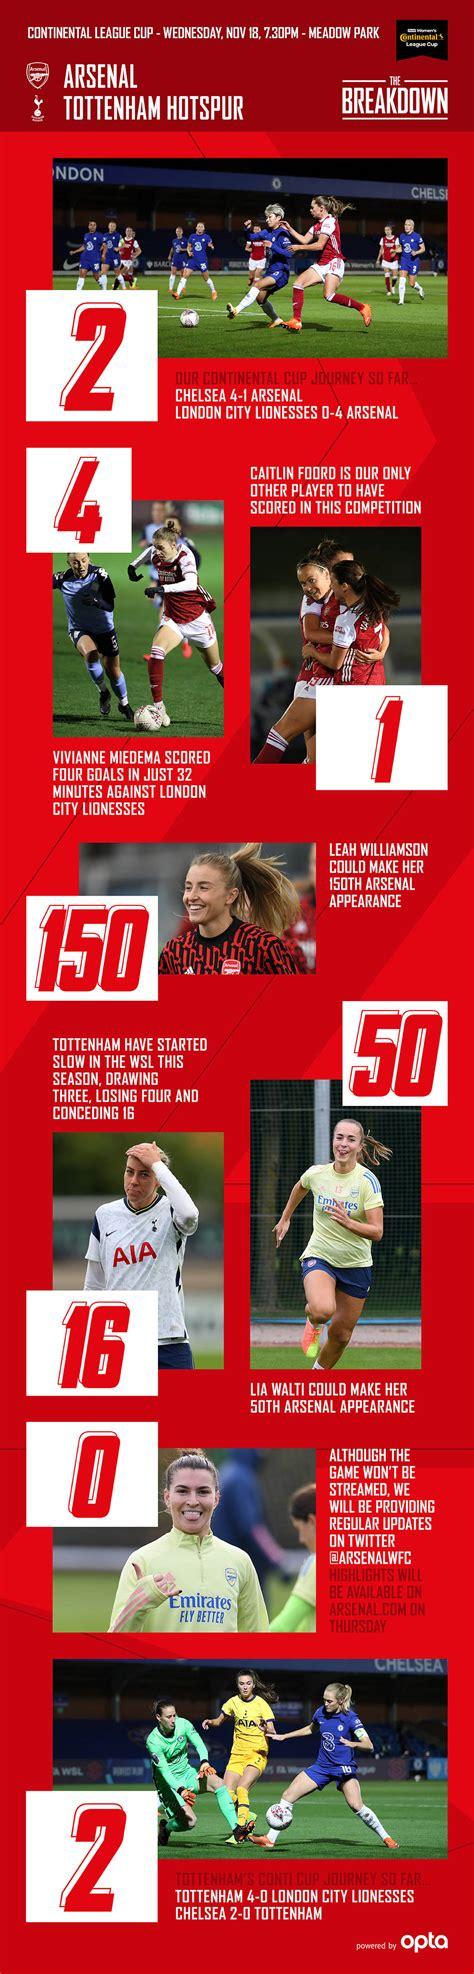 Preview: Arsenal Women v Tottenham | Pre-Match Report ...